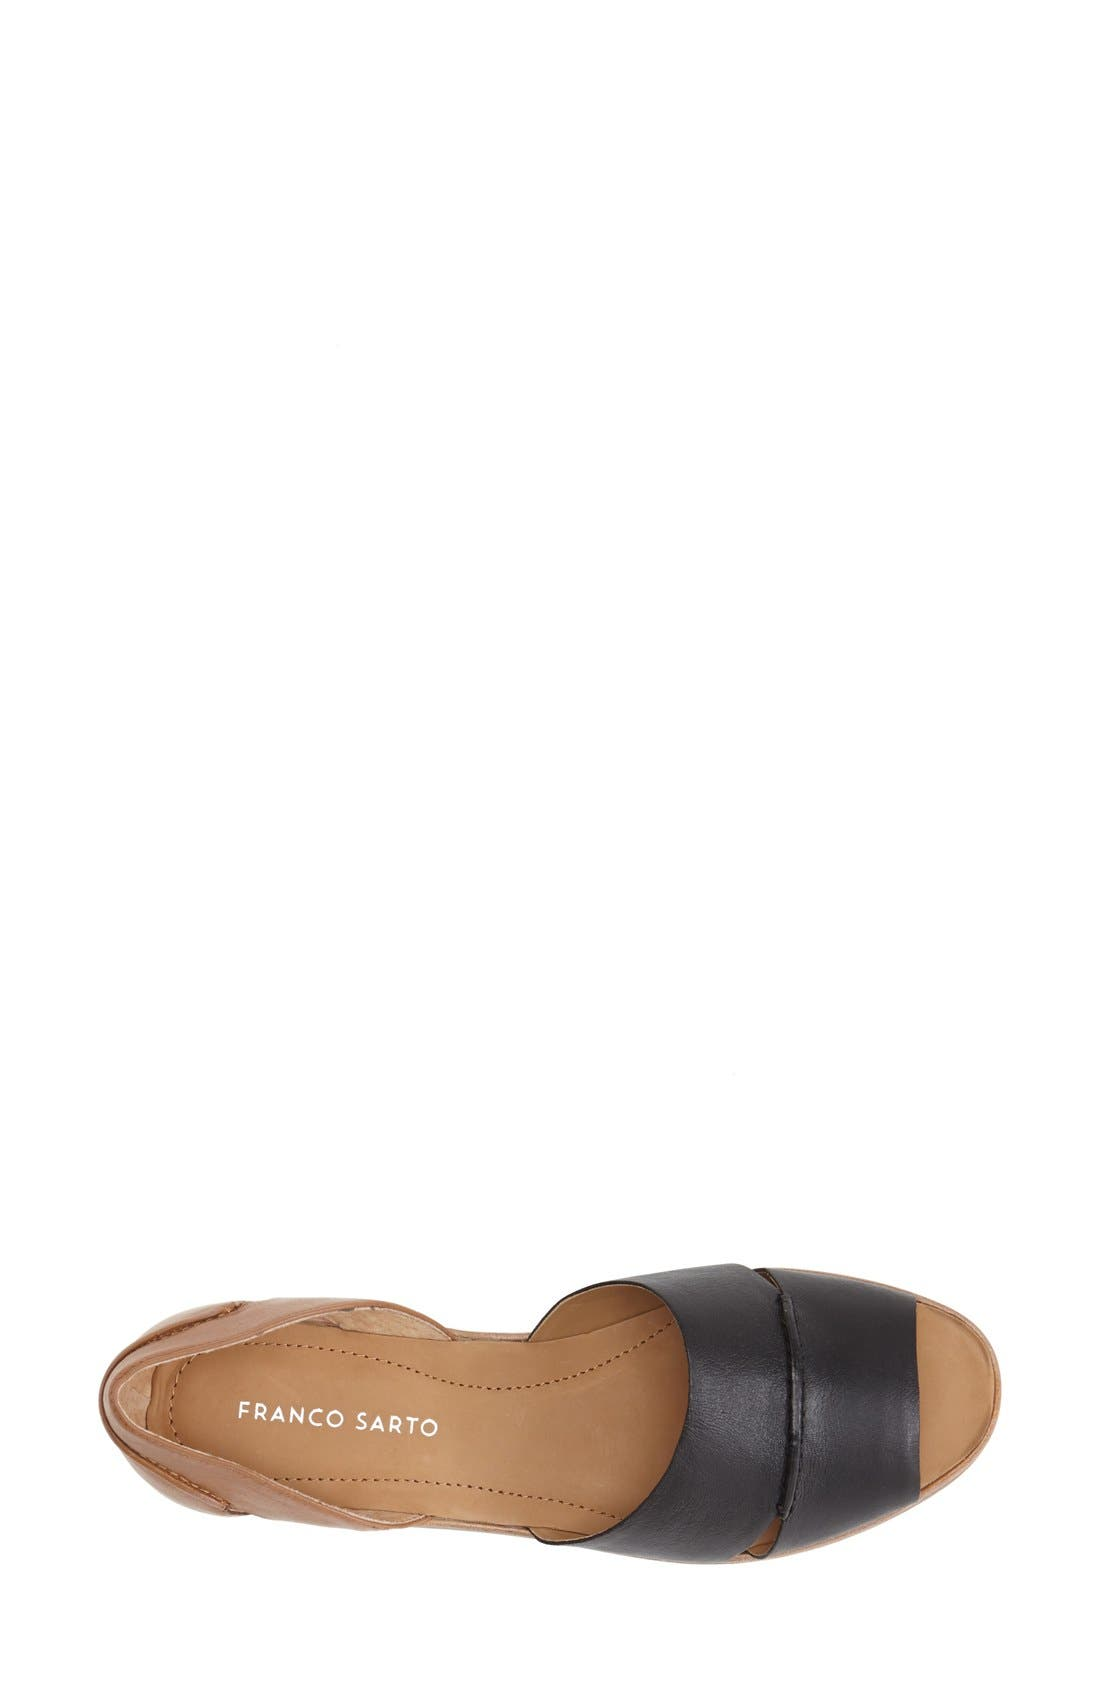 'Vivace' Leather d'Orsay Flat,                             Alternate thumbnail 3, color,                             002